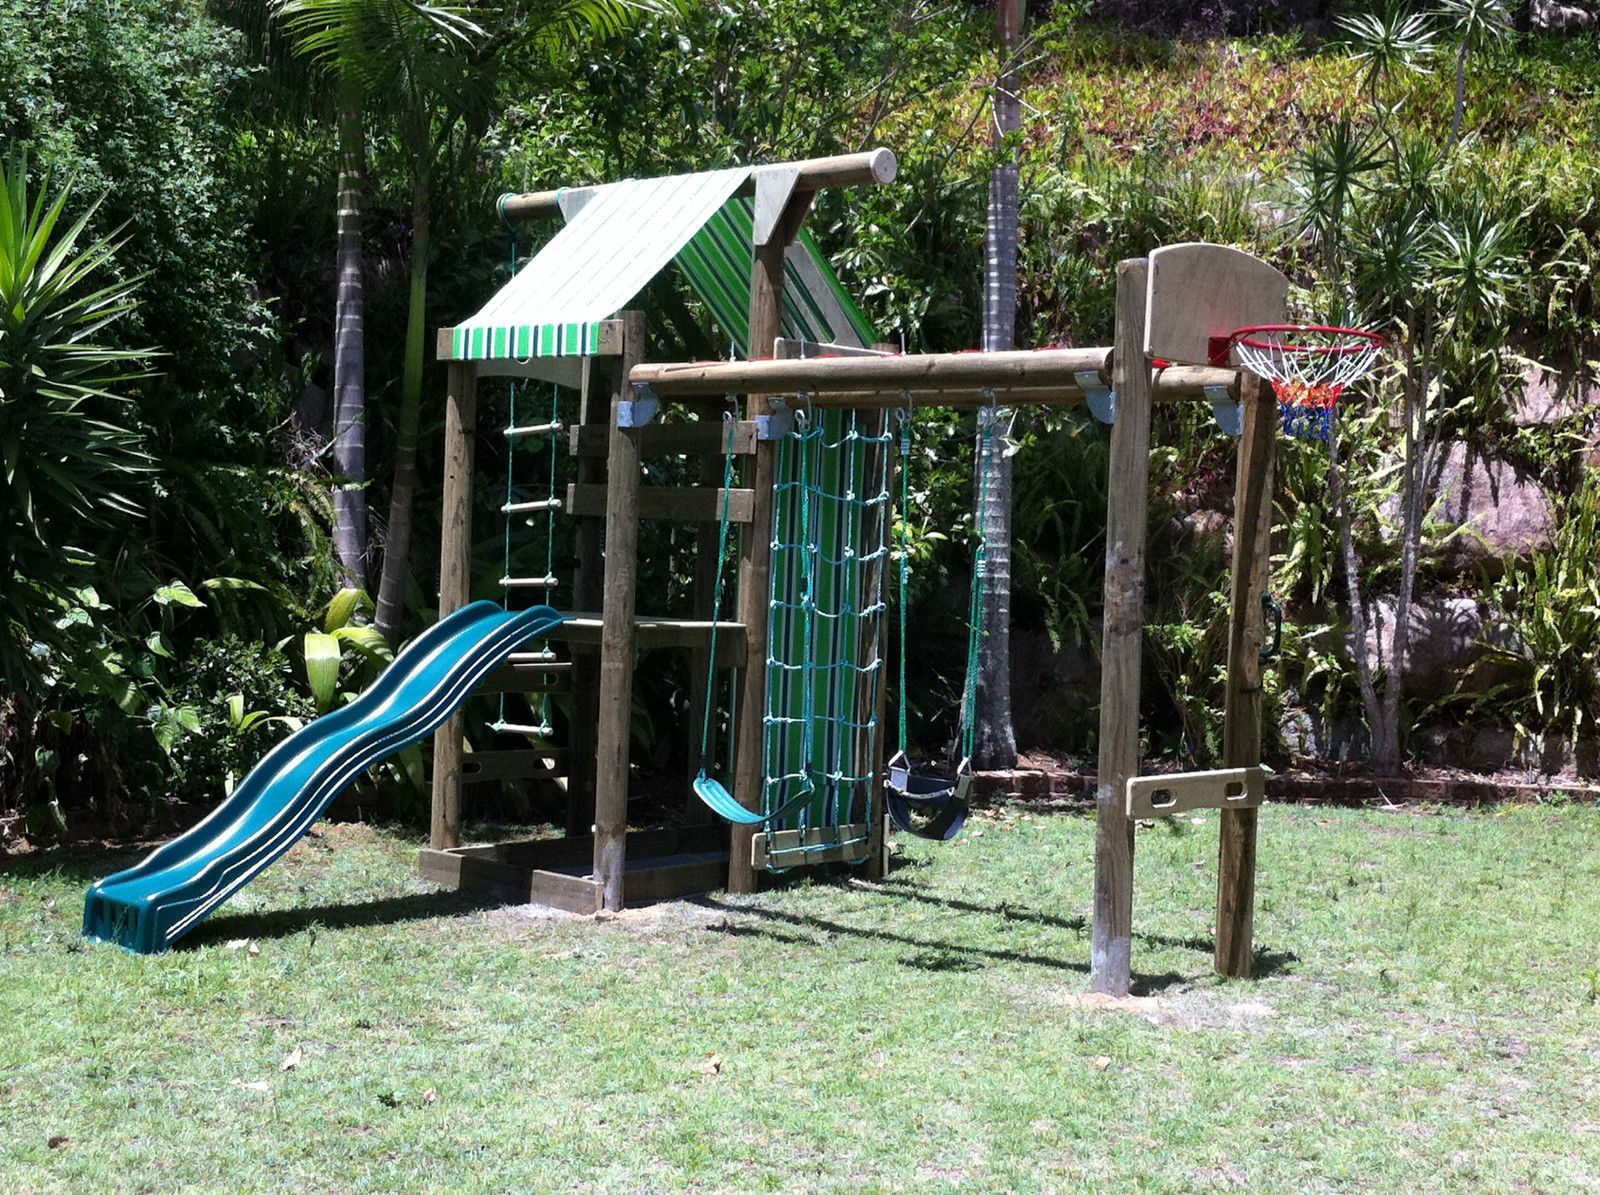 peppertown skyfort special 1 diy playground cubby house swings